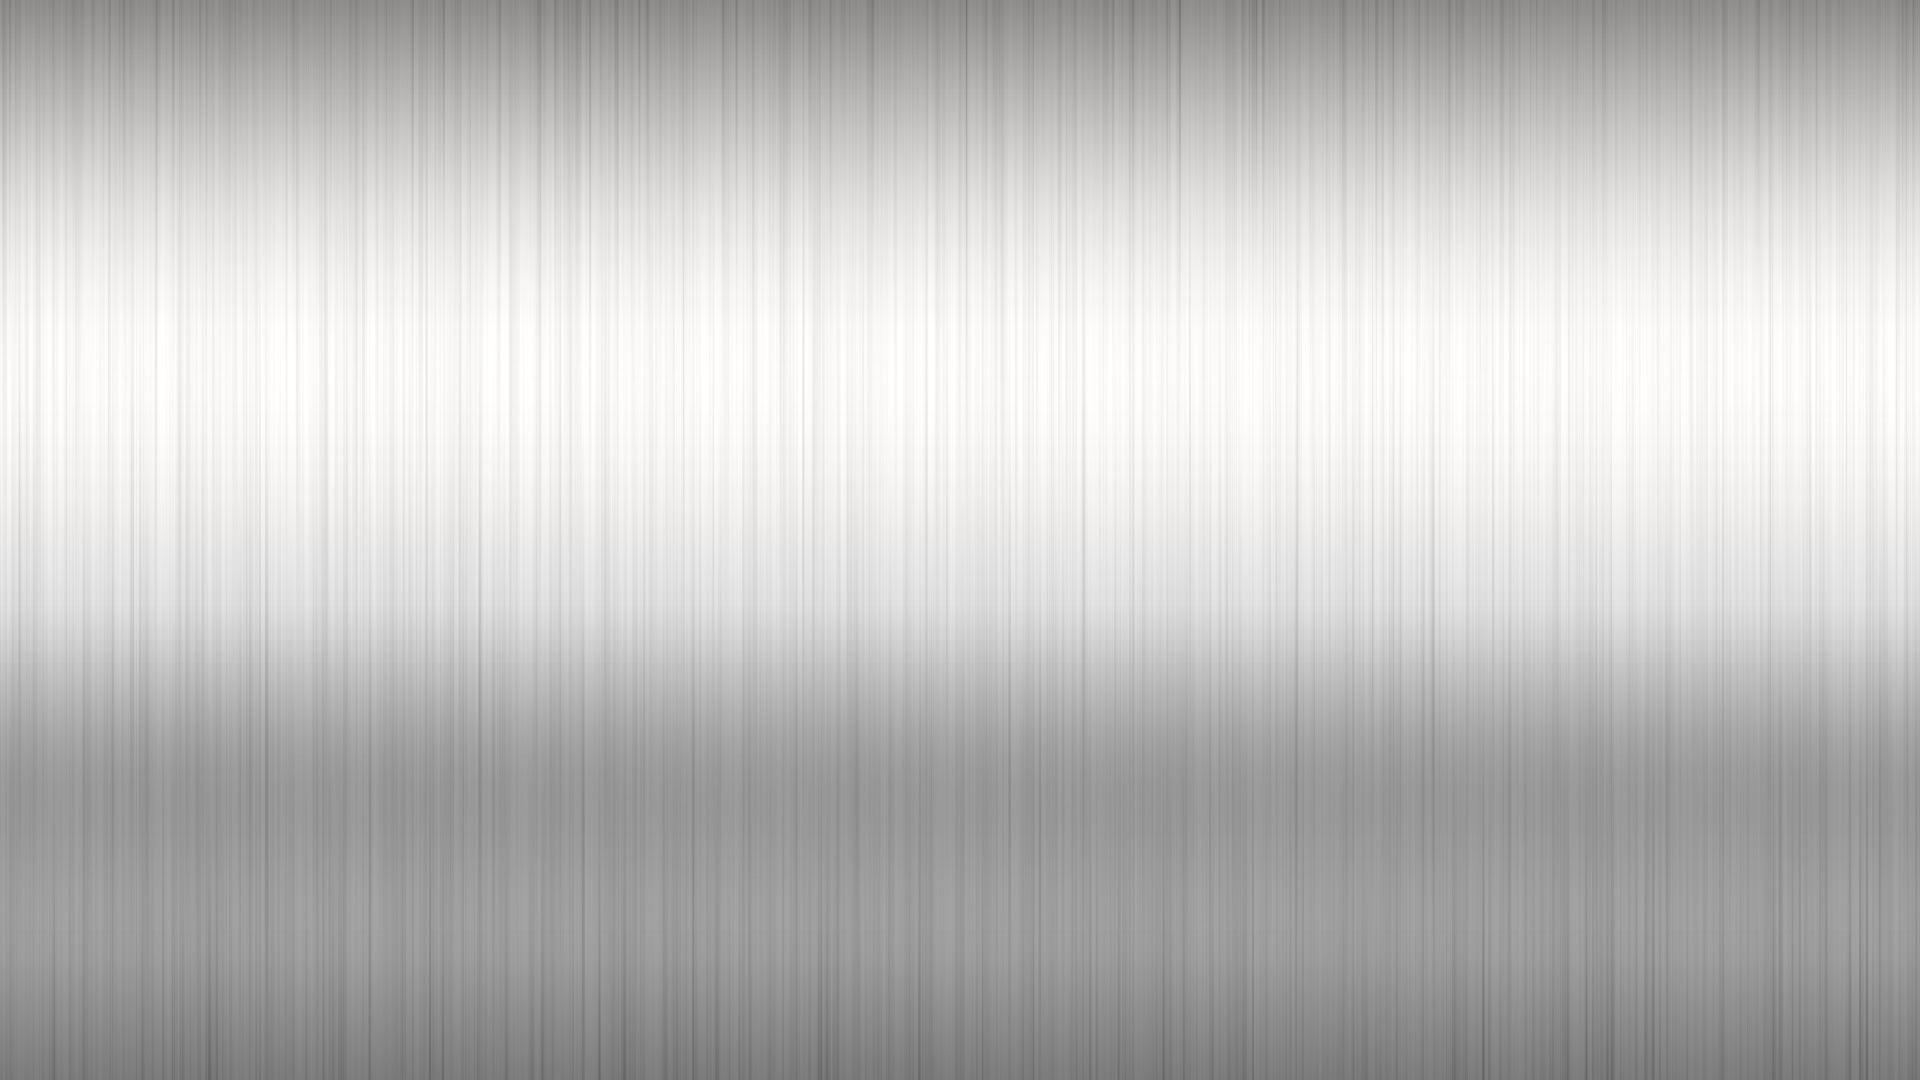 Stainless Steel free hd wallpaper